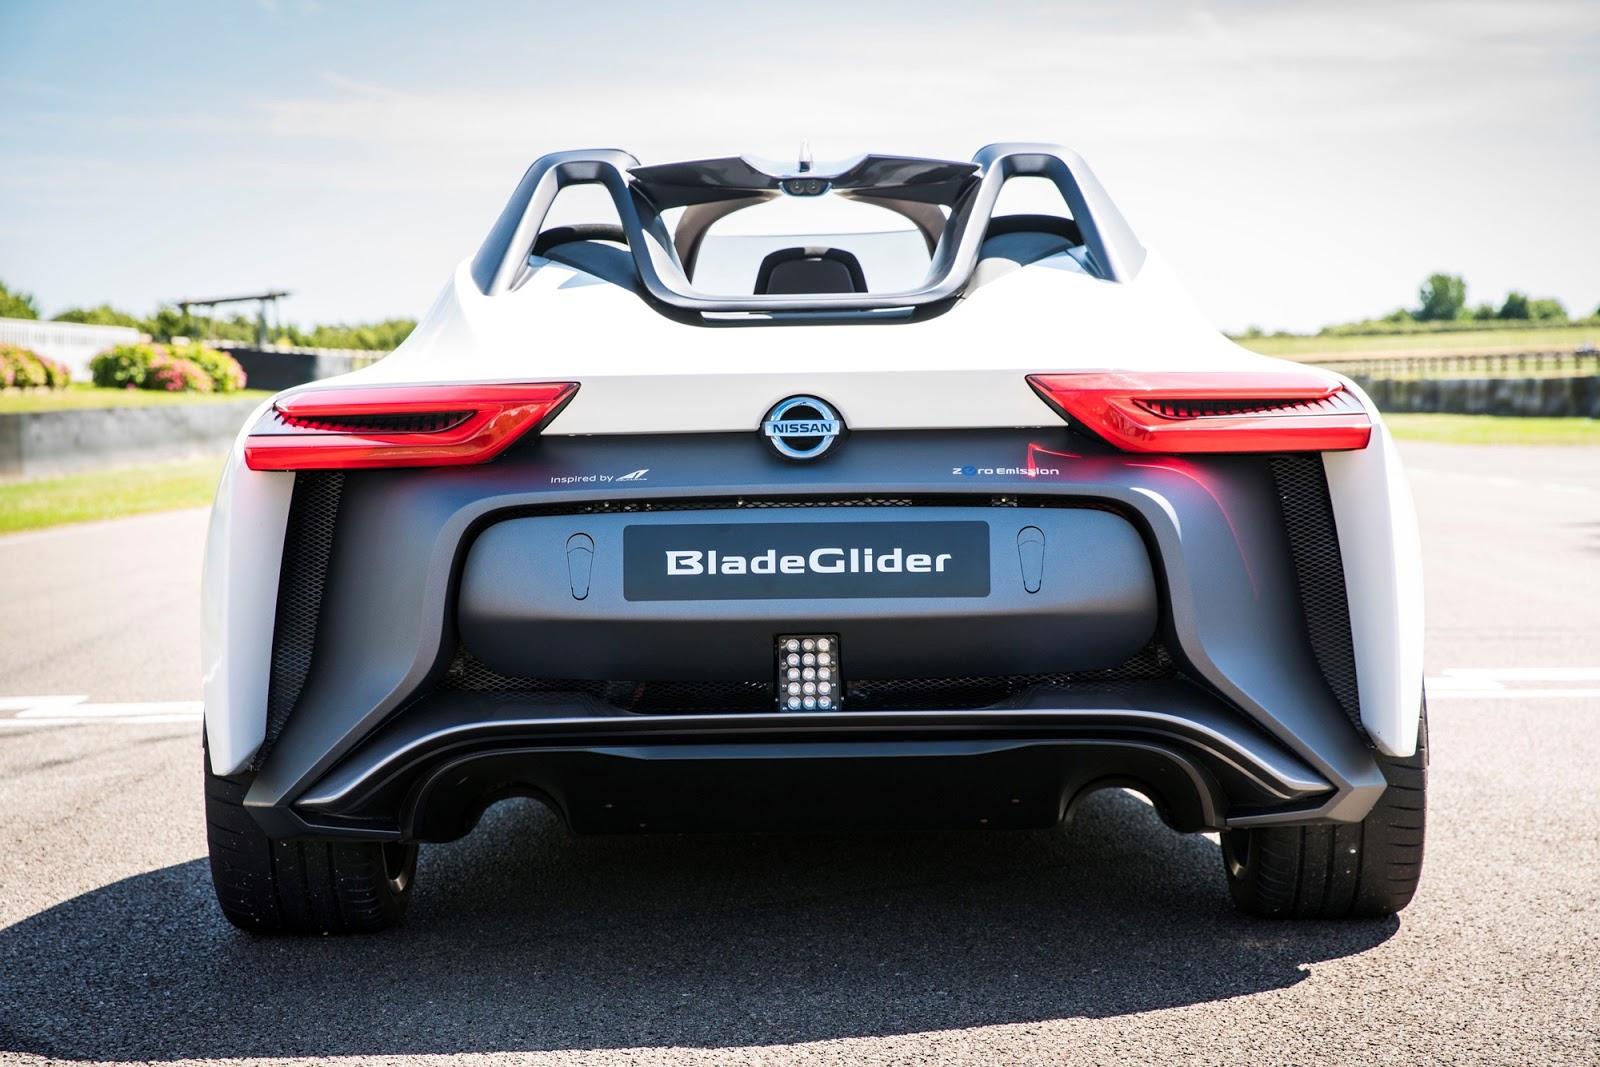 H Nissan με το BladeGlider, γιορτάζει 70 χρόνια στην ηλεκτροκίνηση